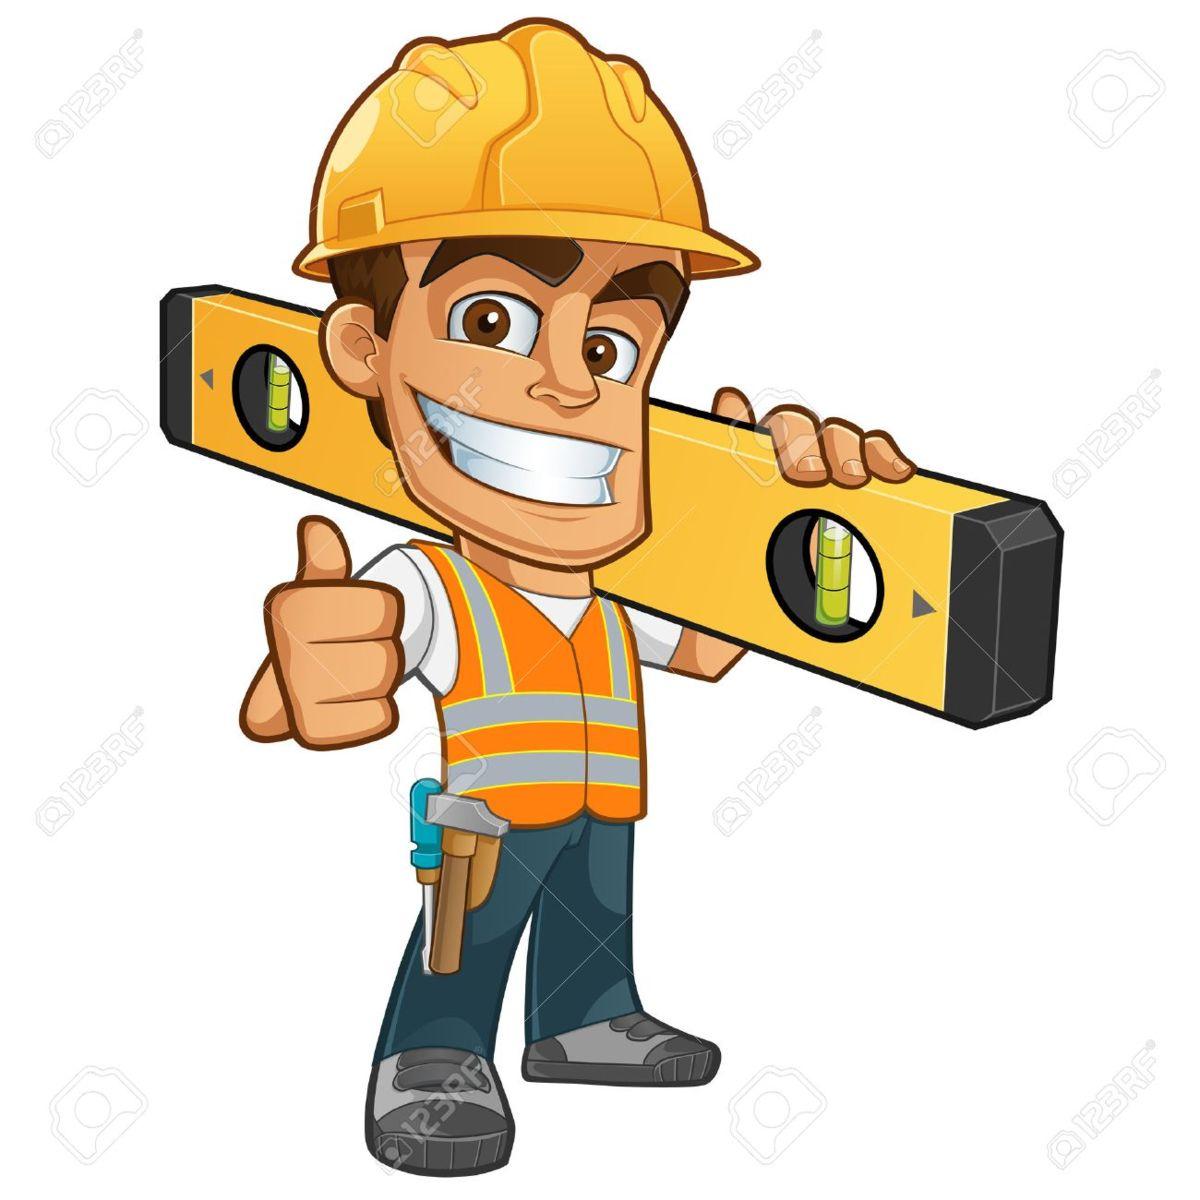 Angajam personal în construcții, plata 250 lei/zi